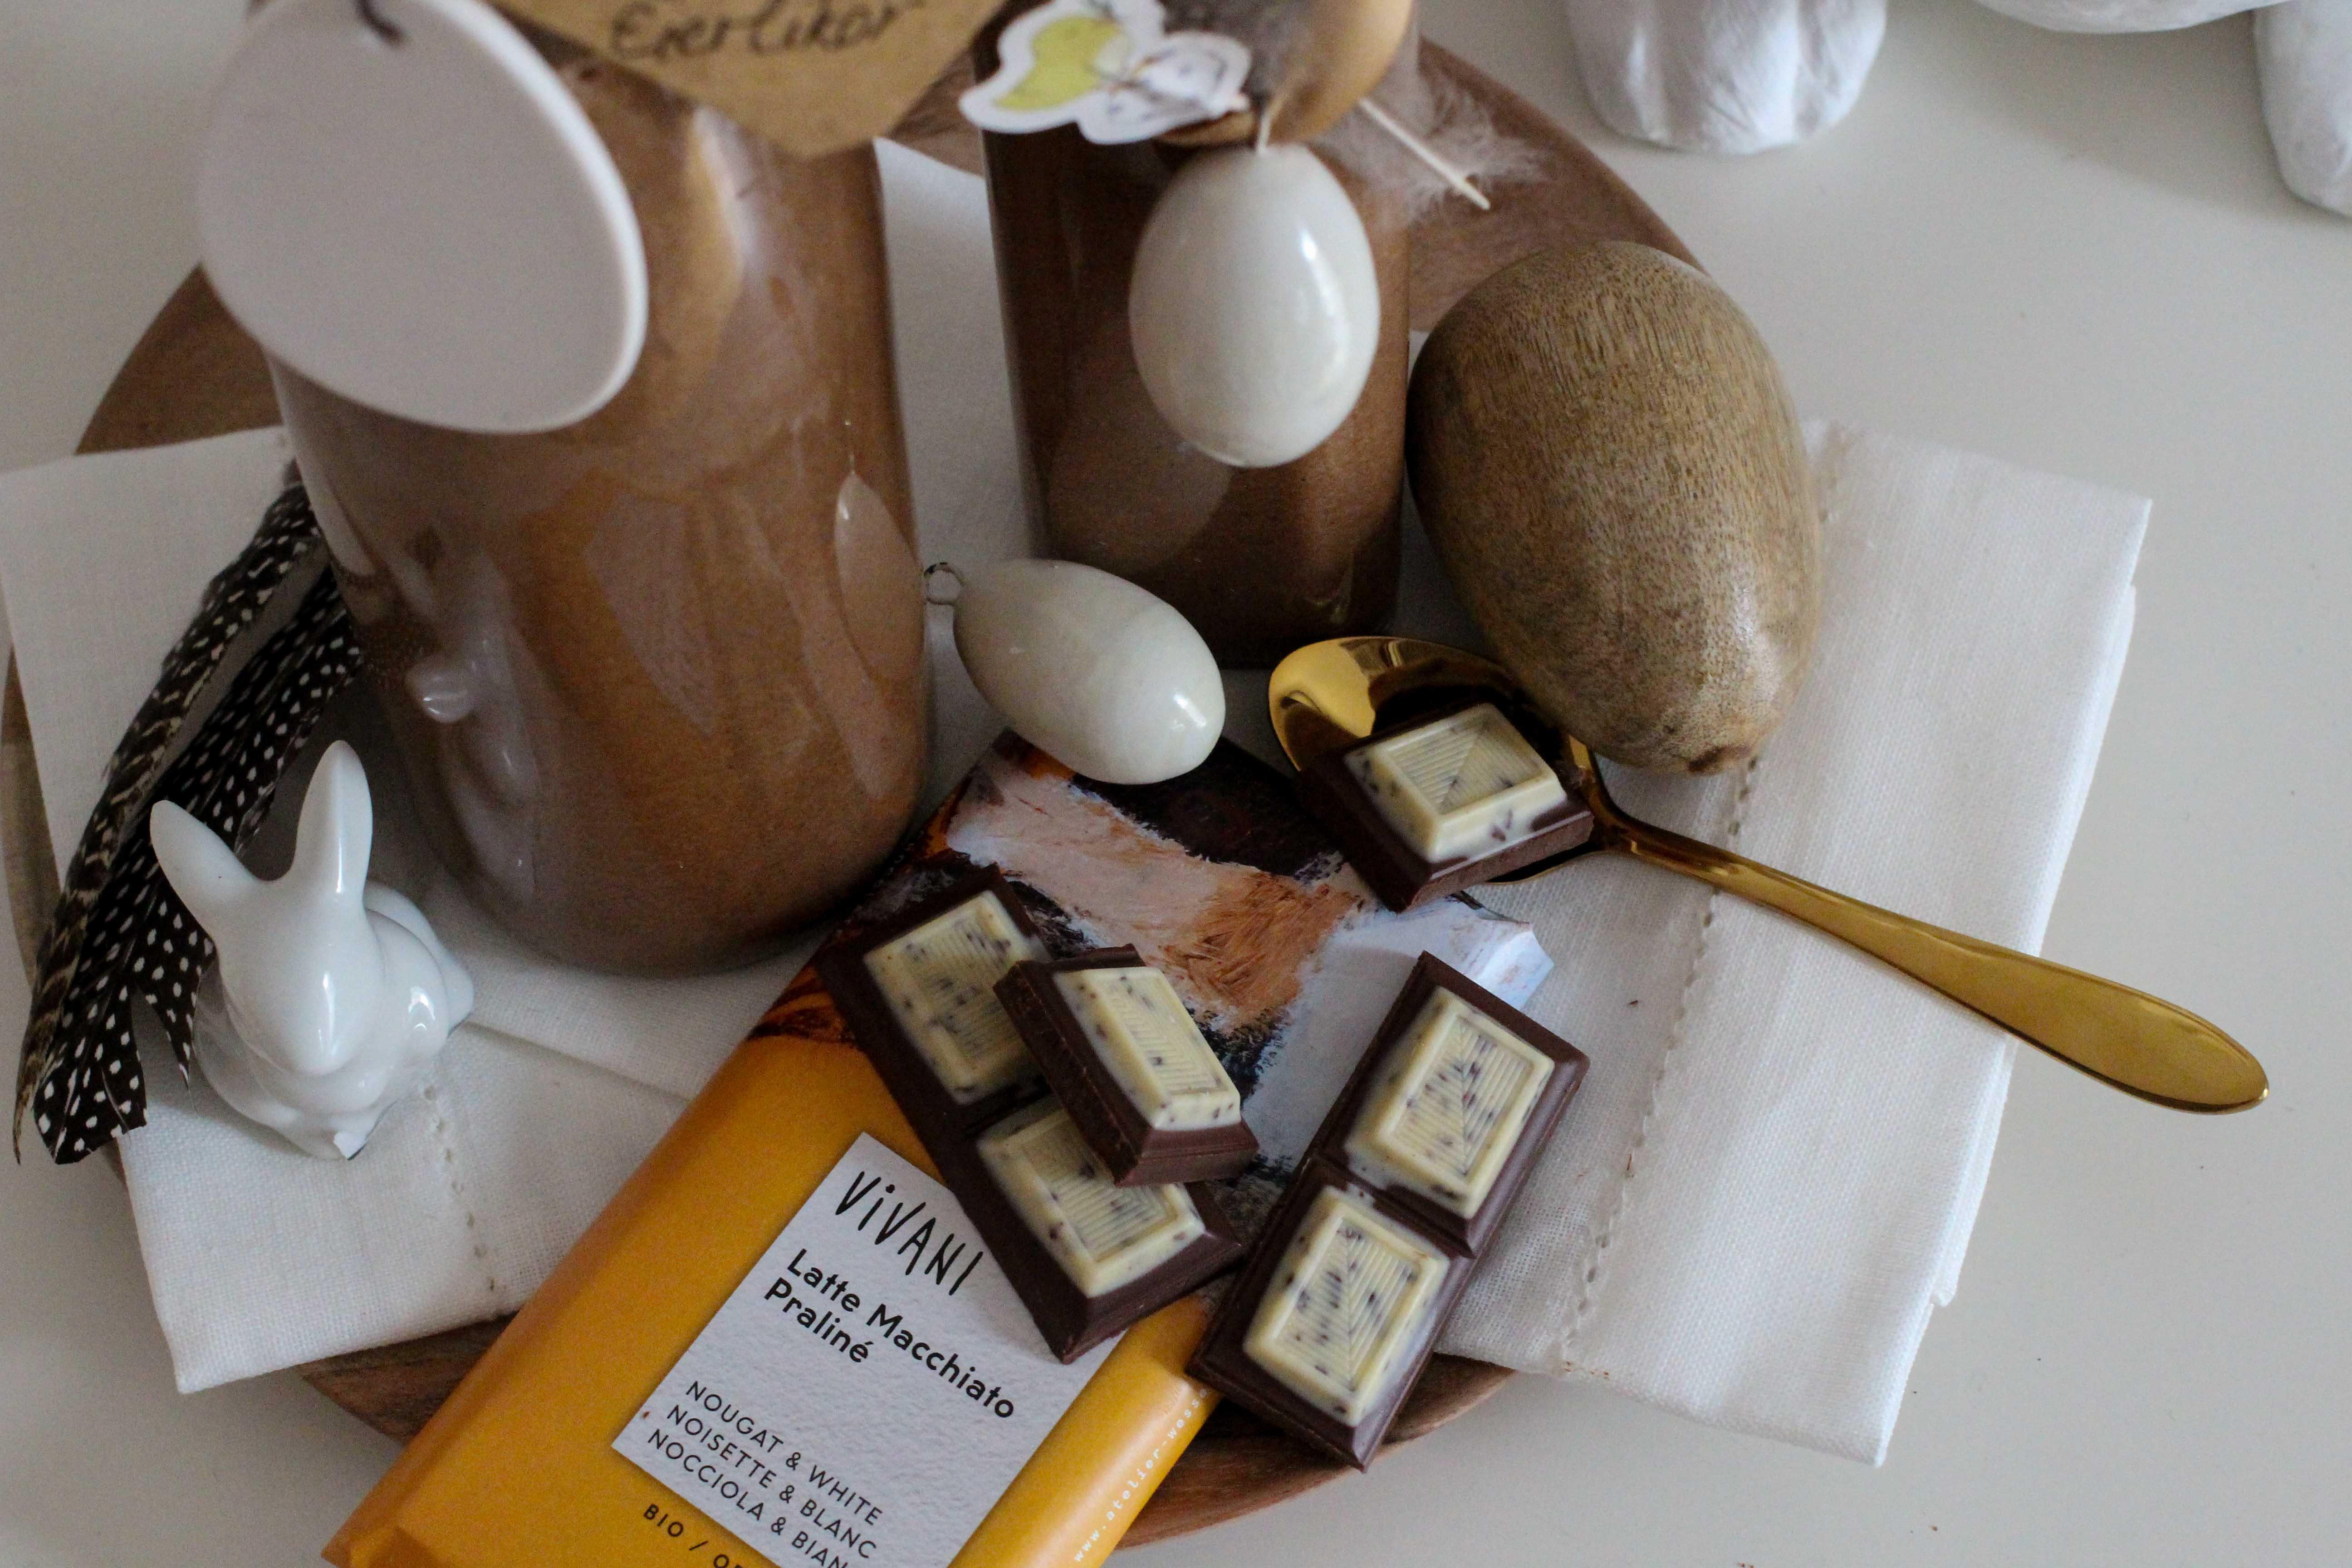 Latte Macchiato Schoko-Eierlikör Rezept einfach selber machen Ostern Vivani Latte Macchiato Praline Schokolade 3